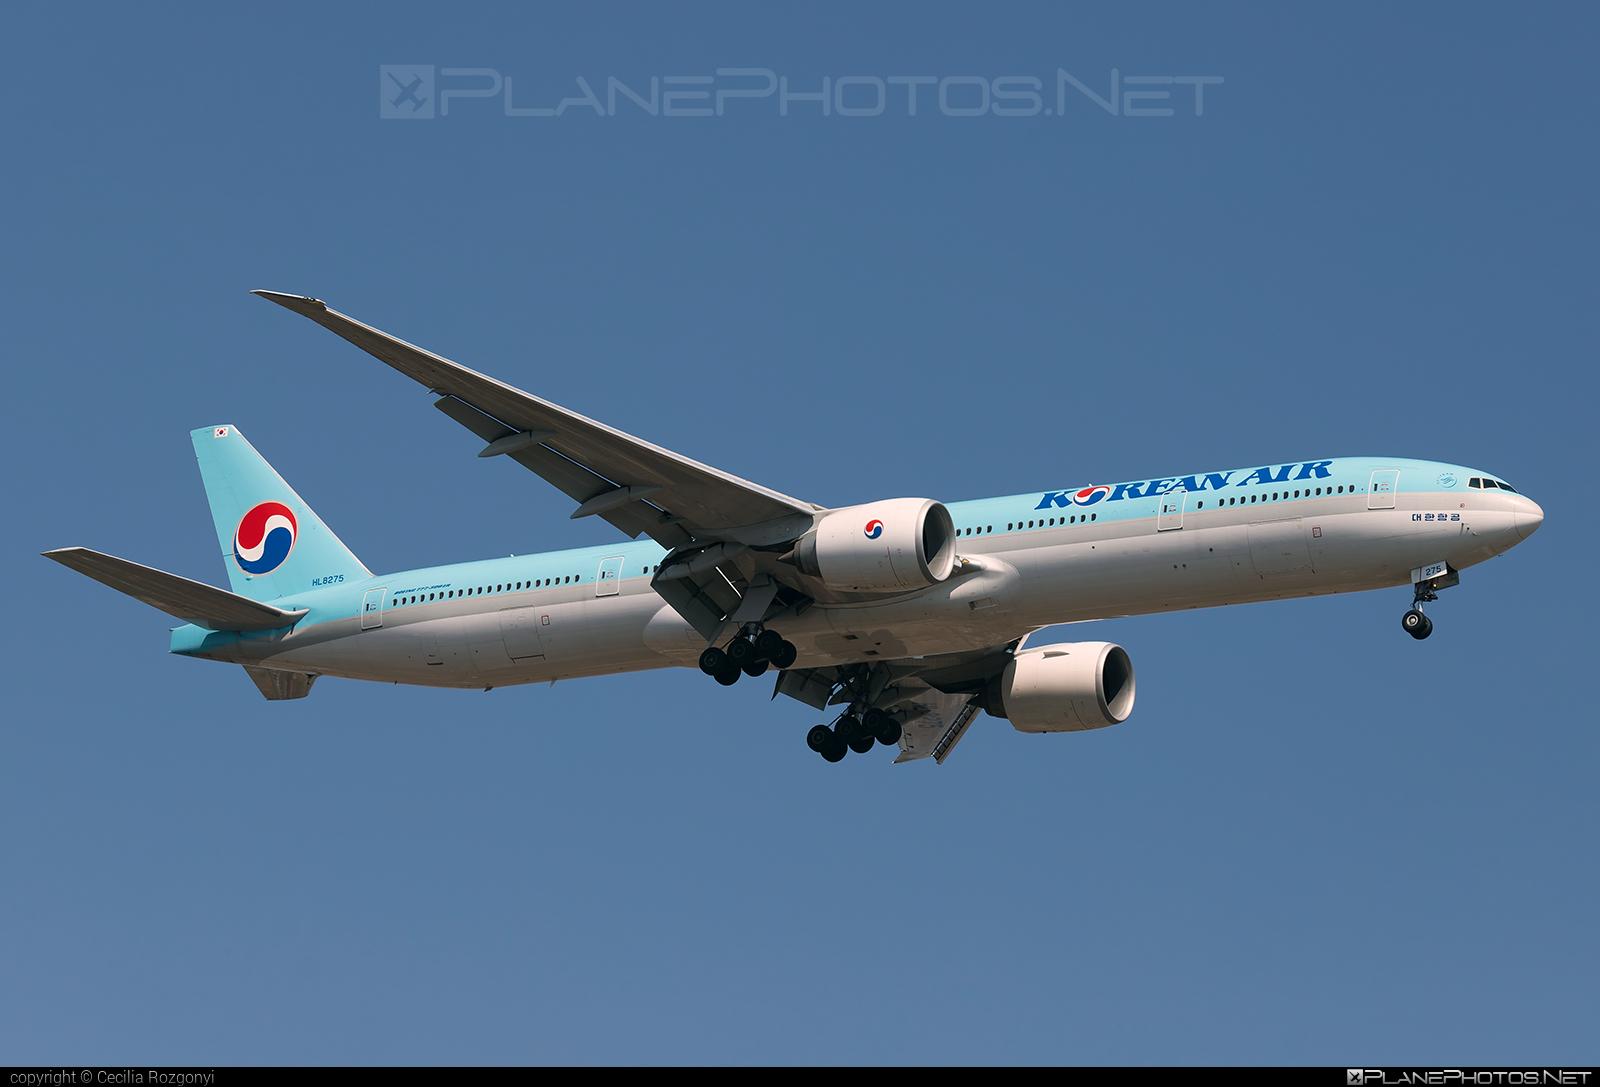 Boeing 777-300ER - HL8275 operated by Korean Air #b777 #b777er #boeing #boeing777 #koreanair #tripleseven